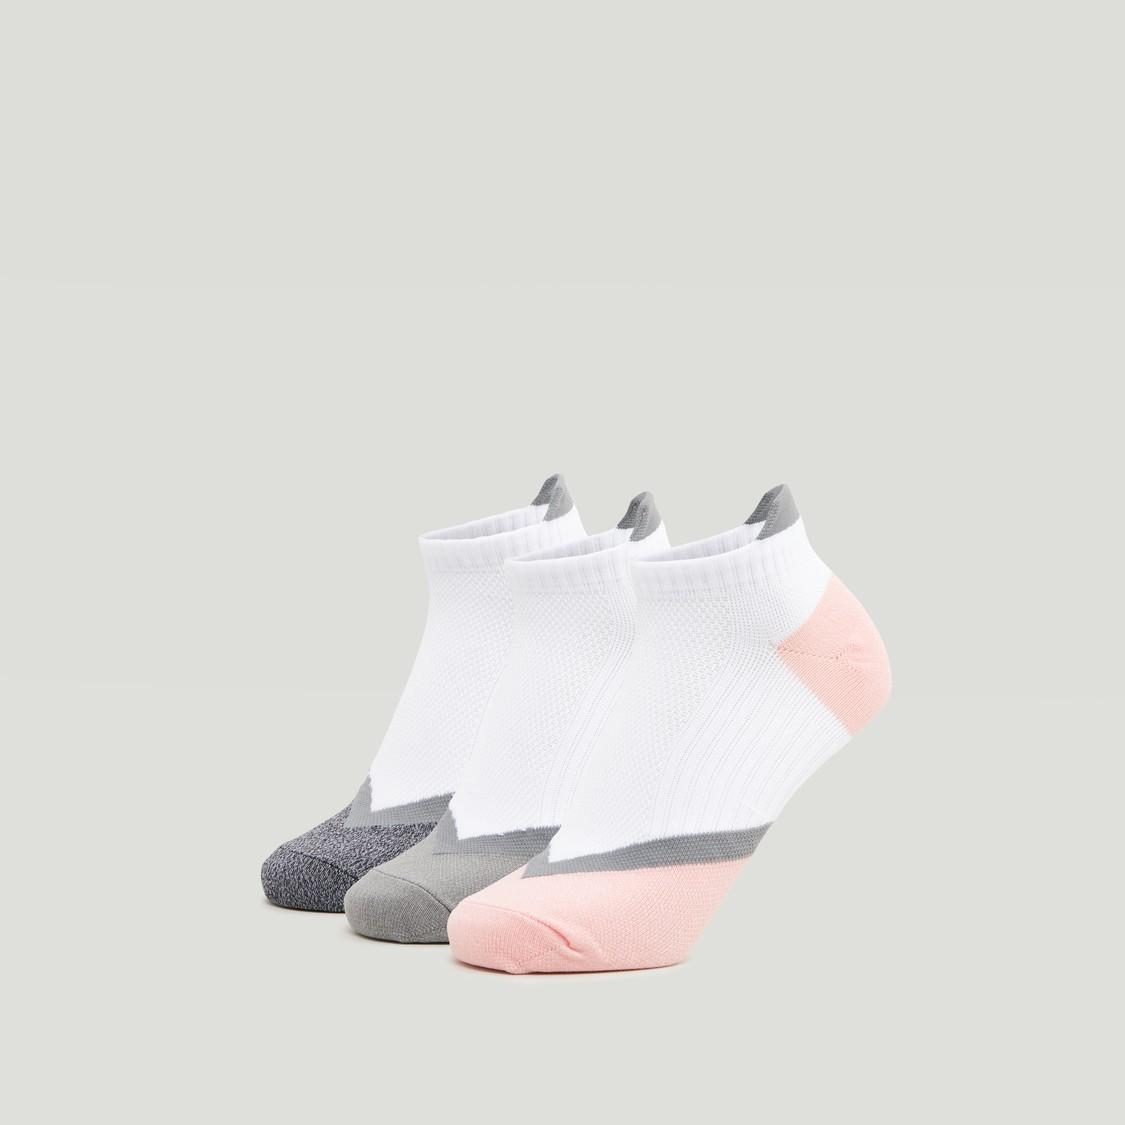 Set of 3 - Printed Ankle Length Socks with Cuffed Hem